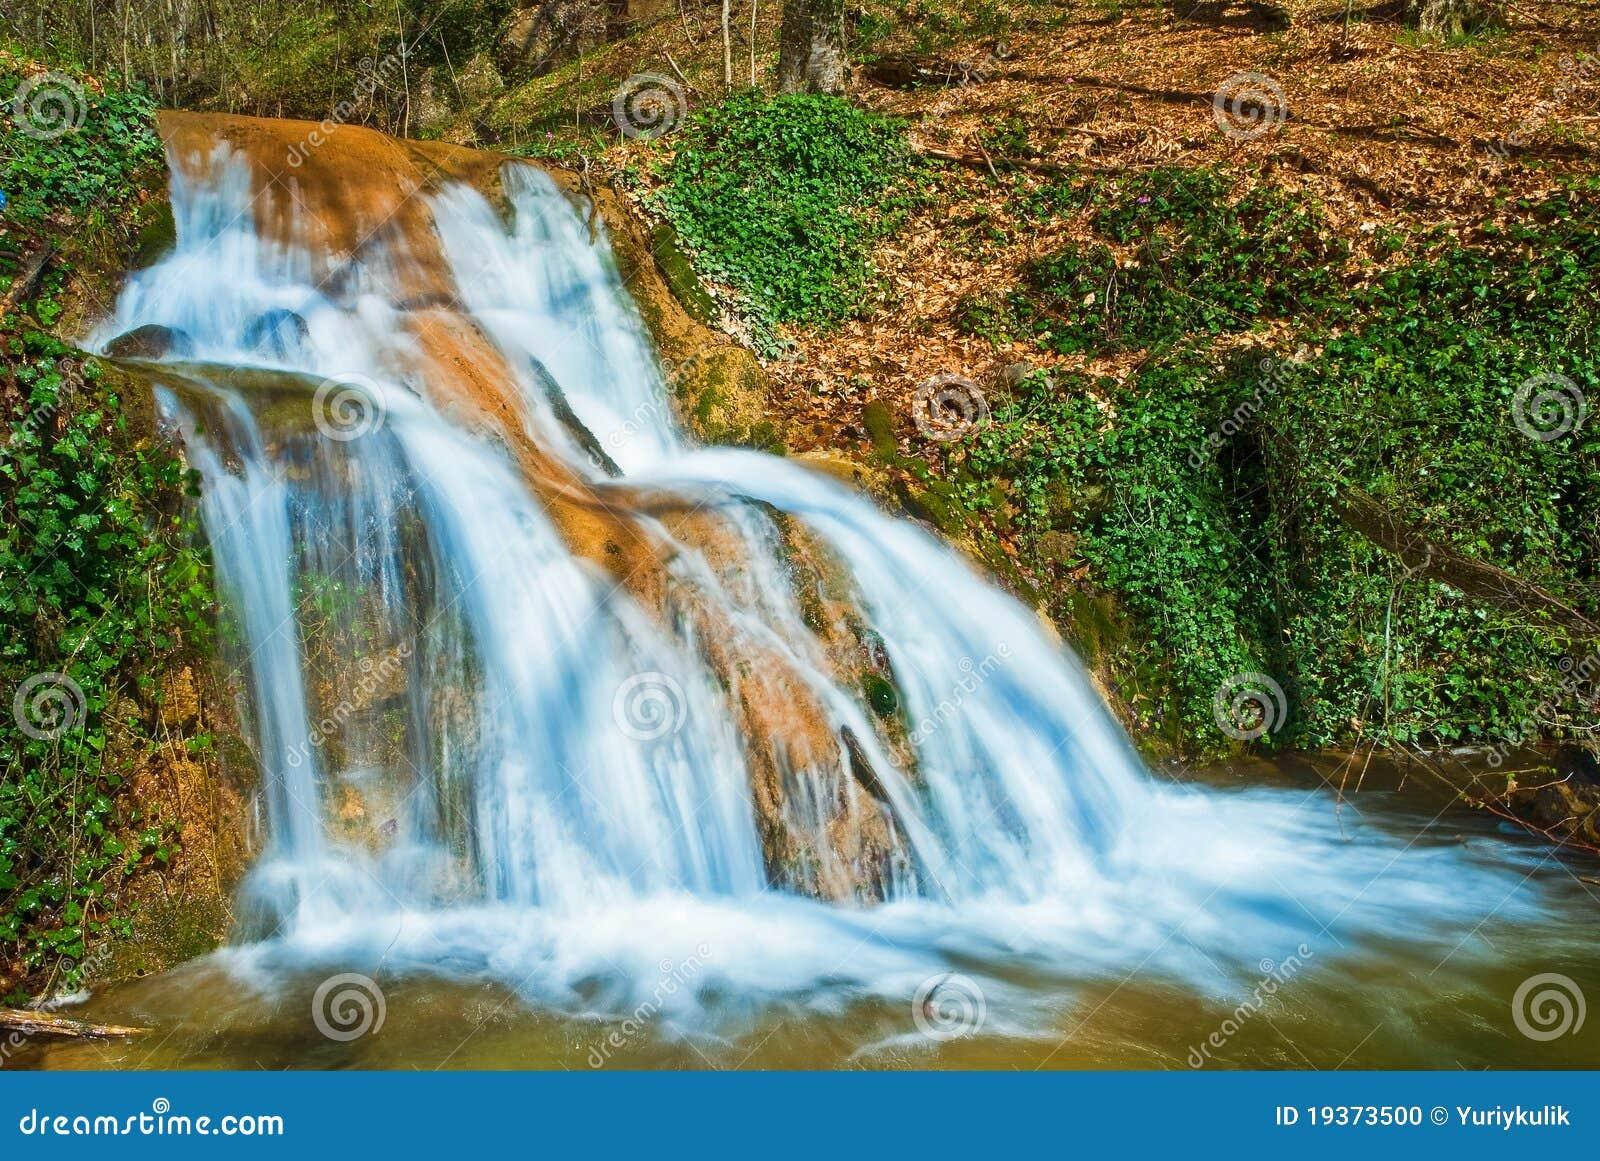 Cachoeira bonita da mola